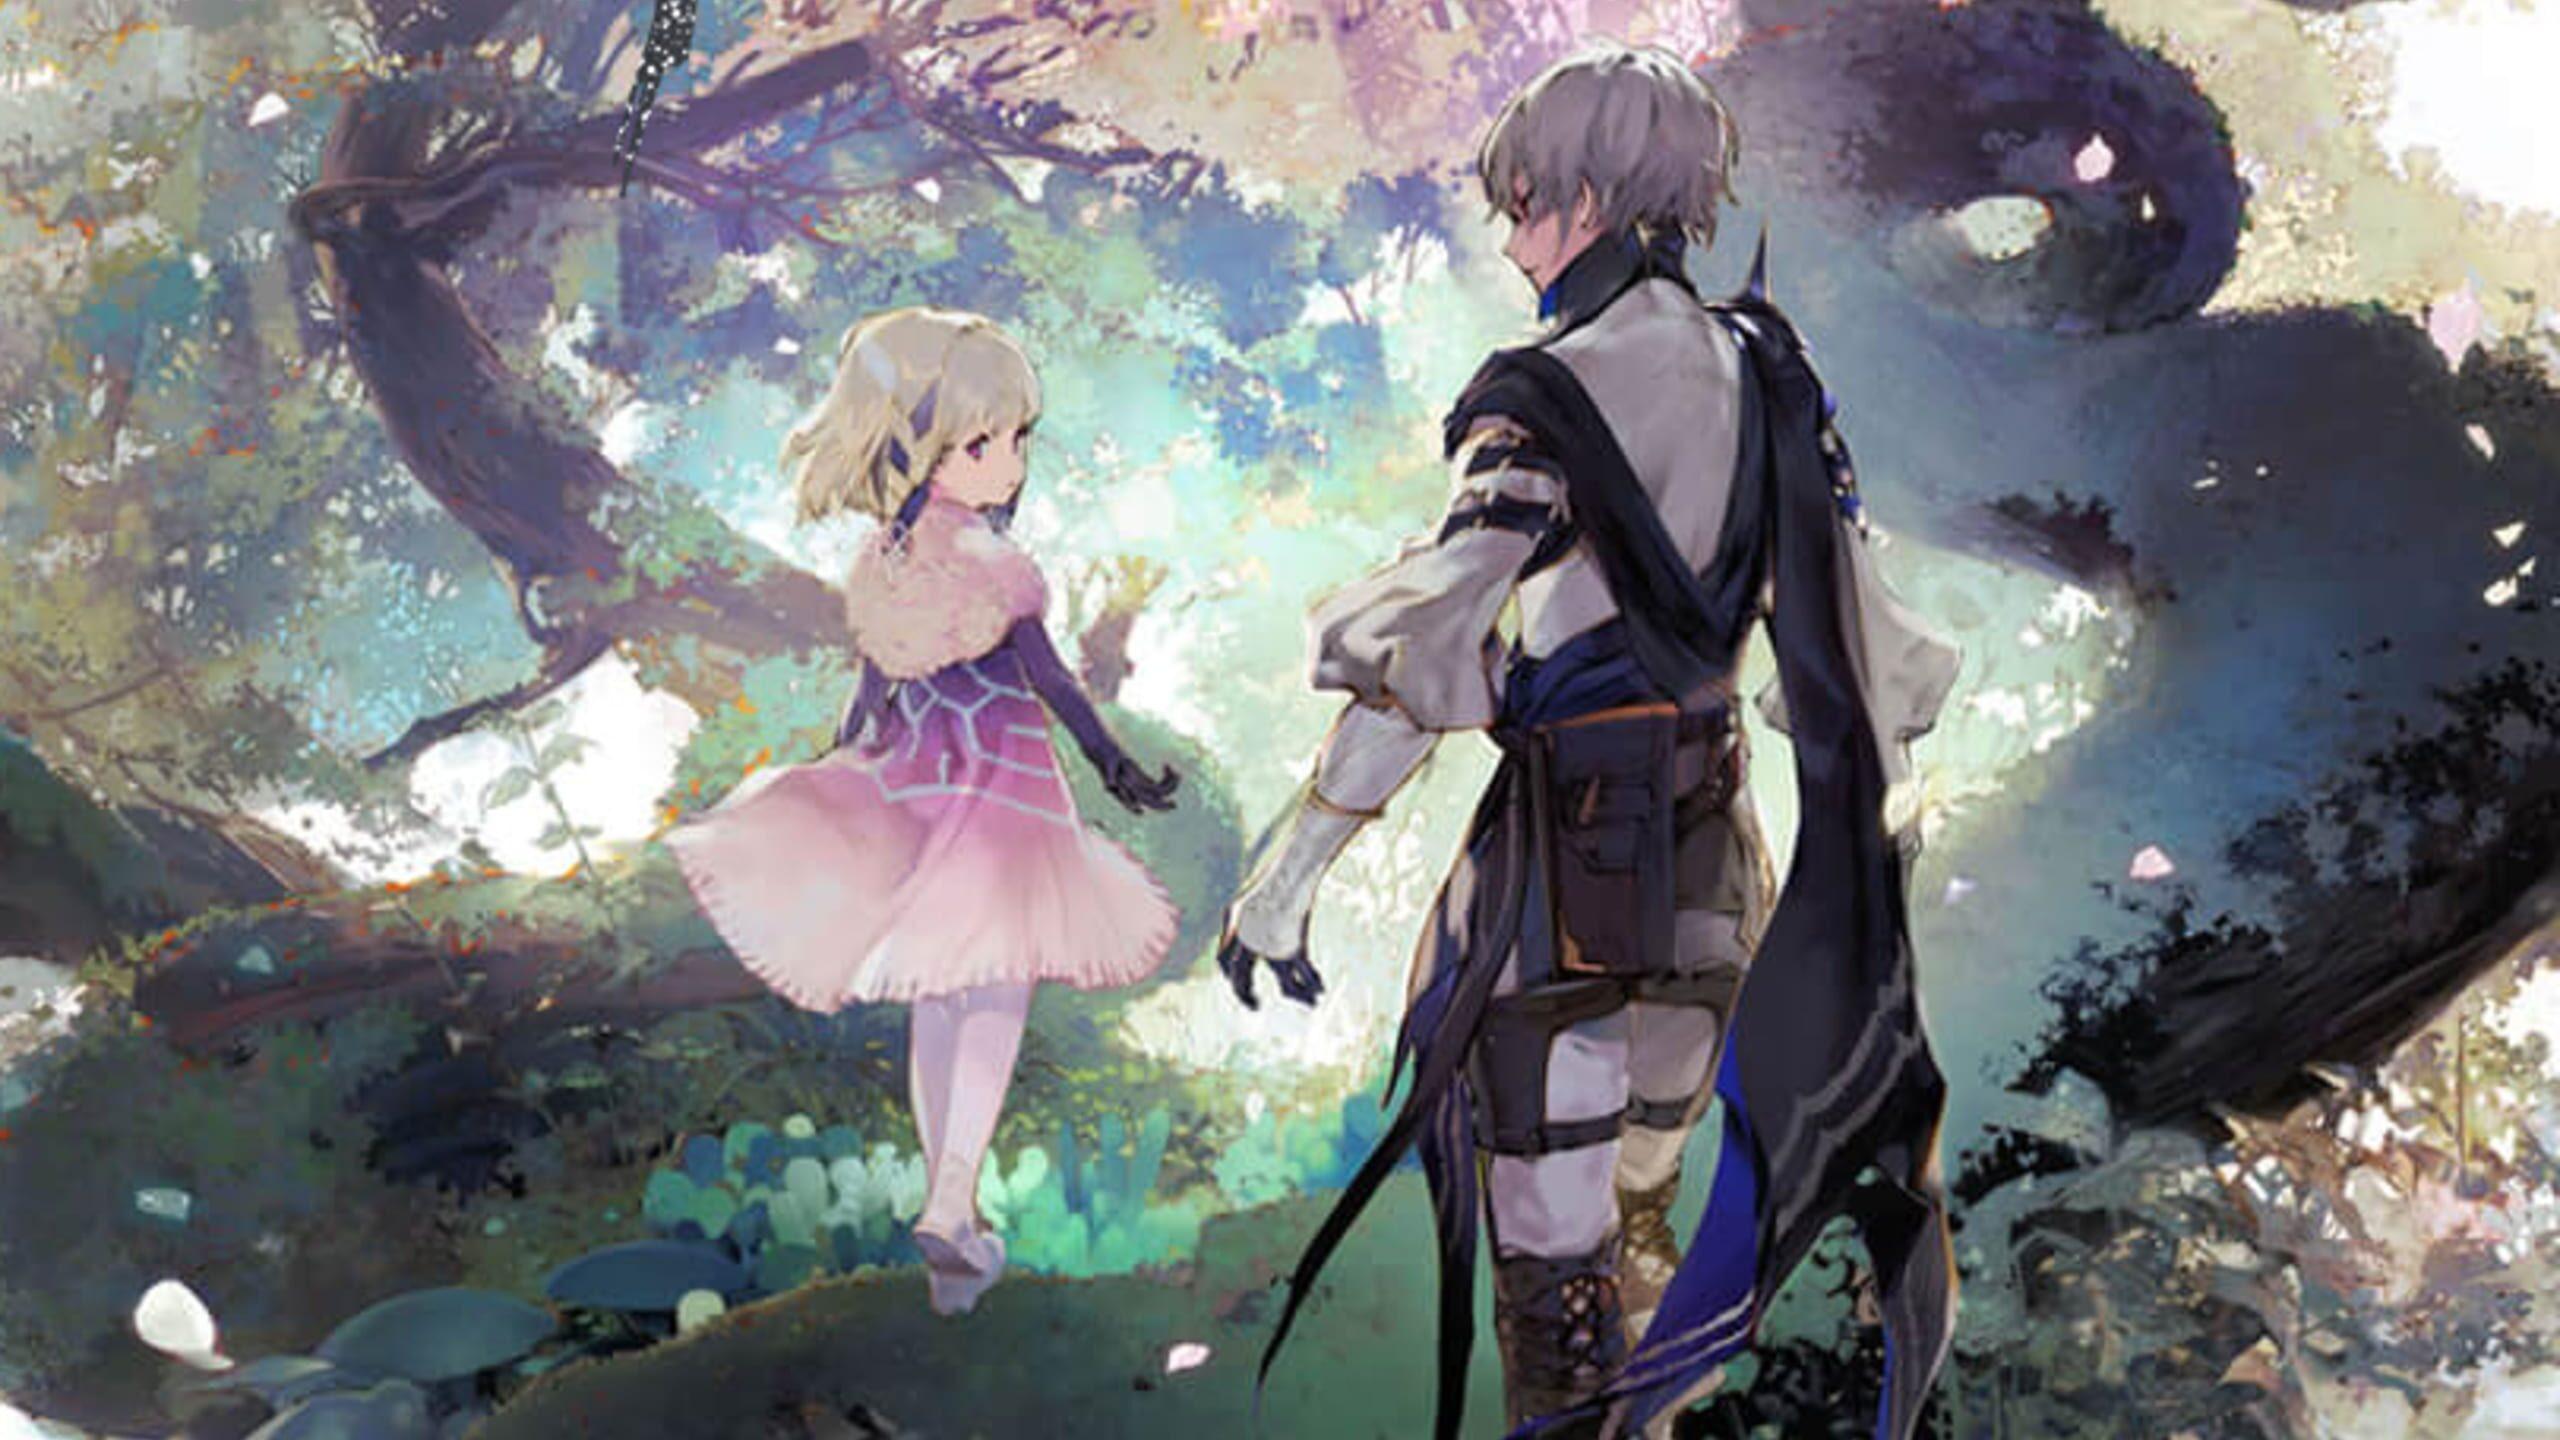 game cover art for Oninaki